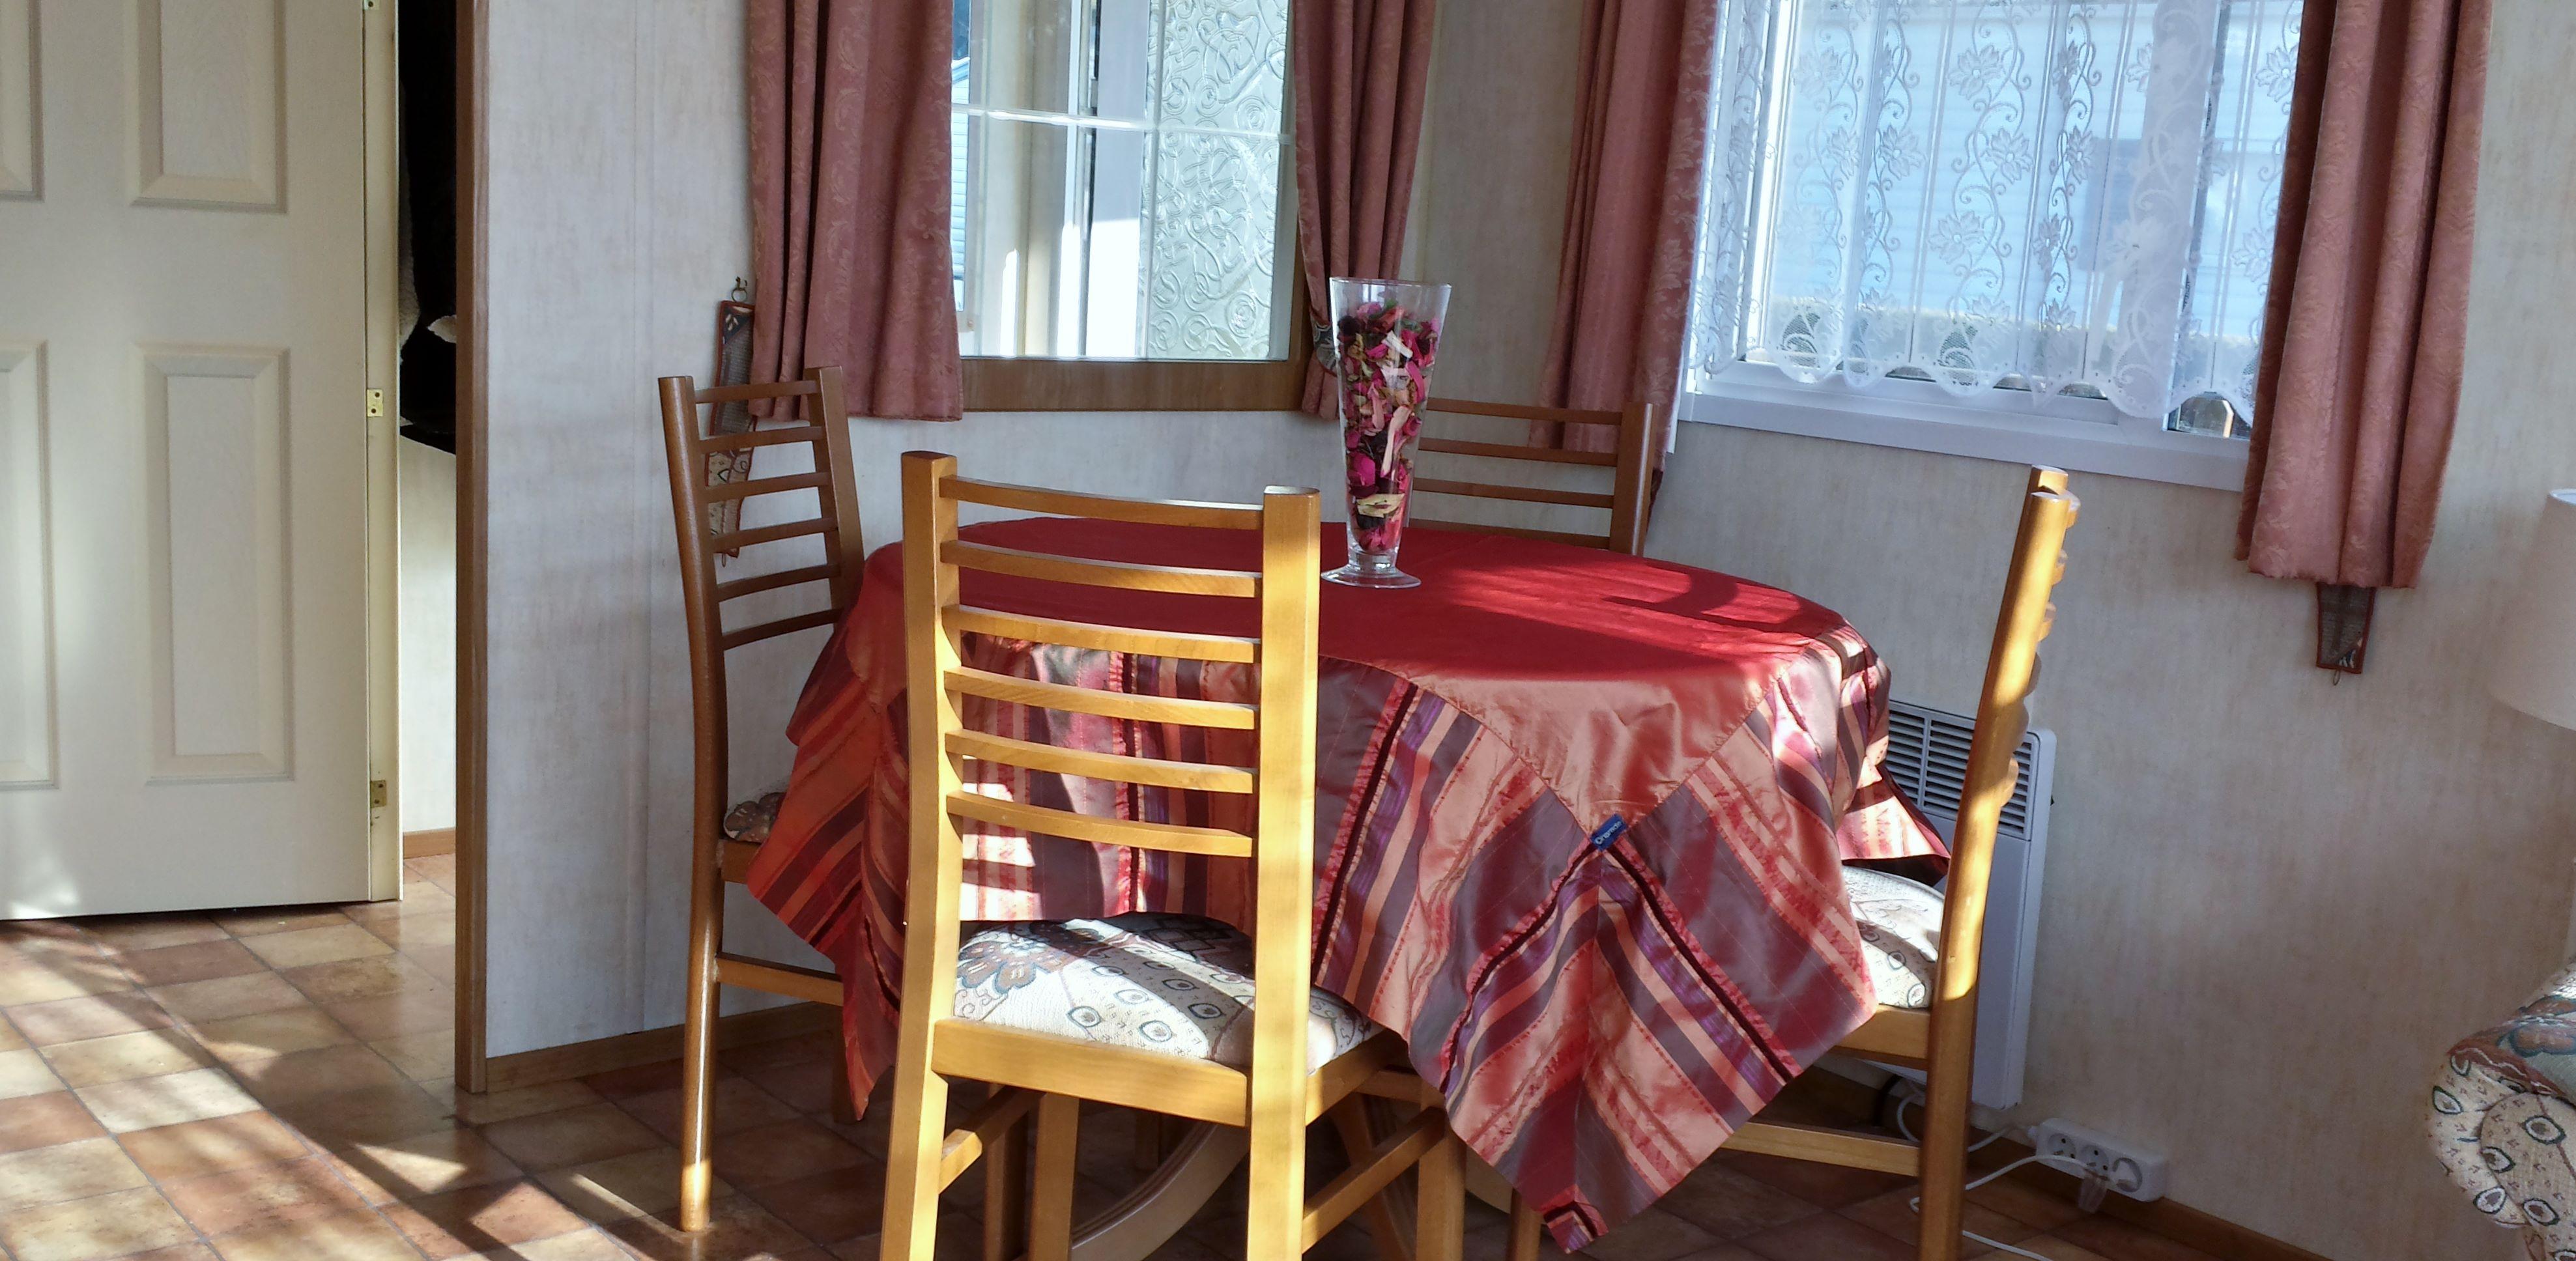 Mobil-home 6 personnes Quend Plage - location vacances  n°55467